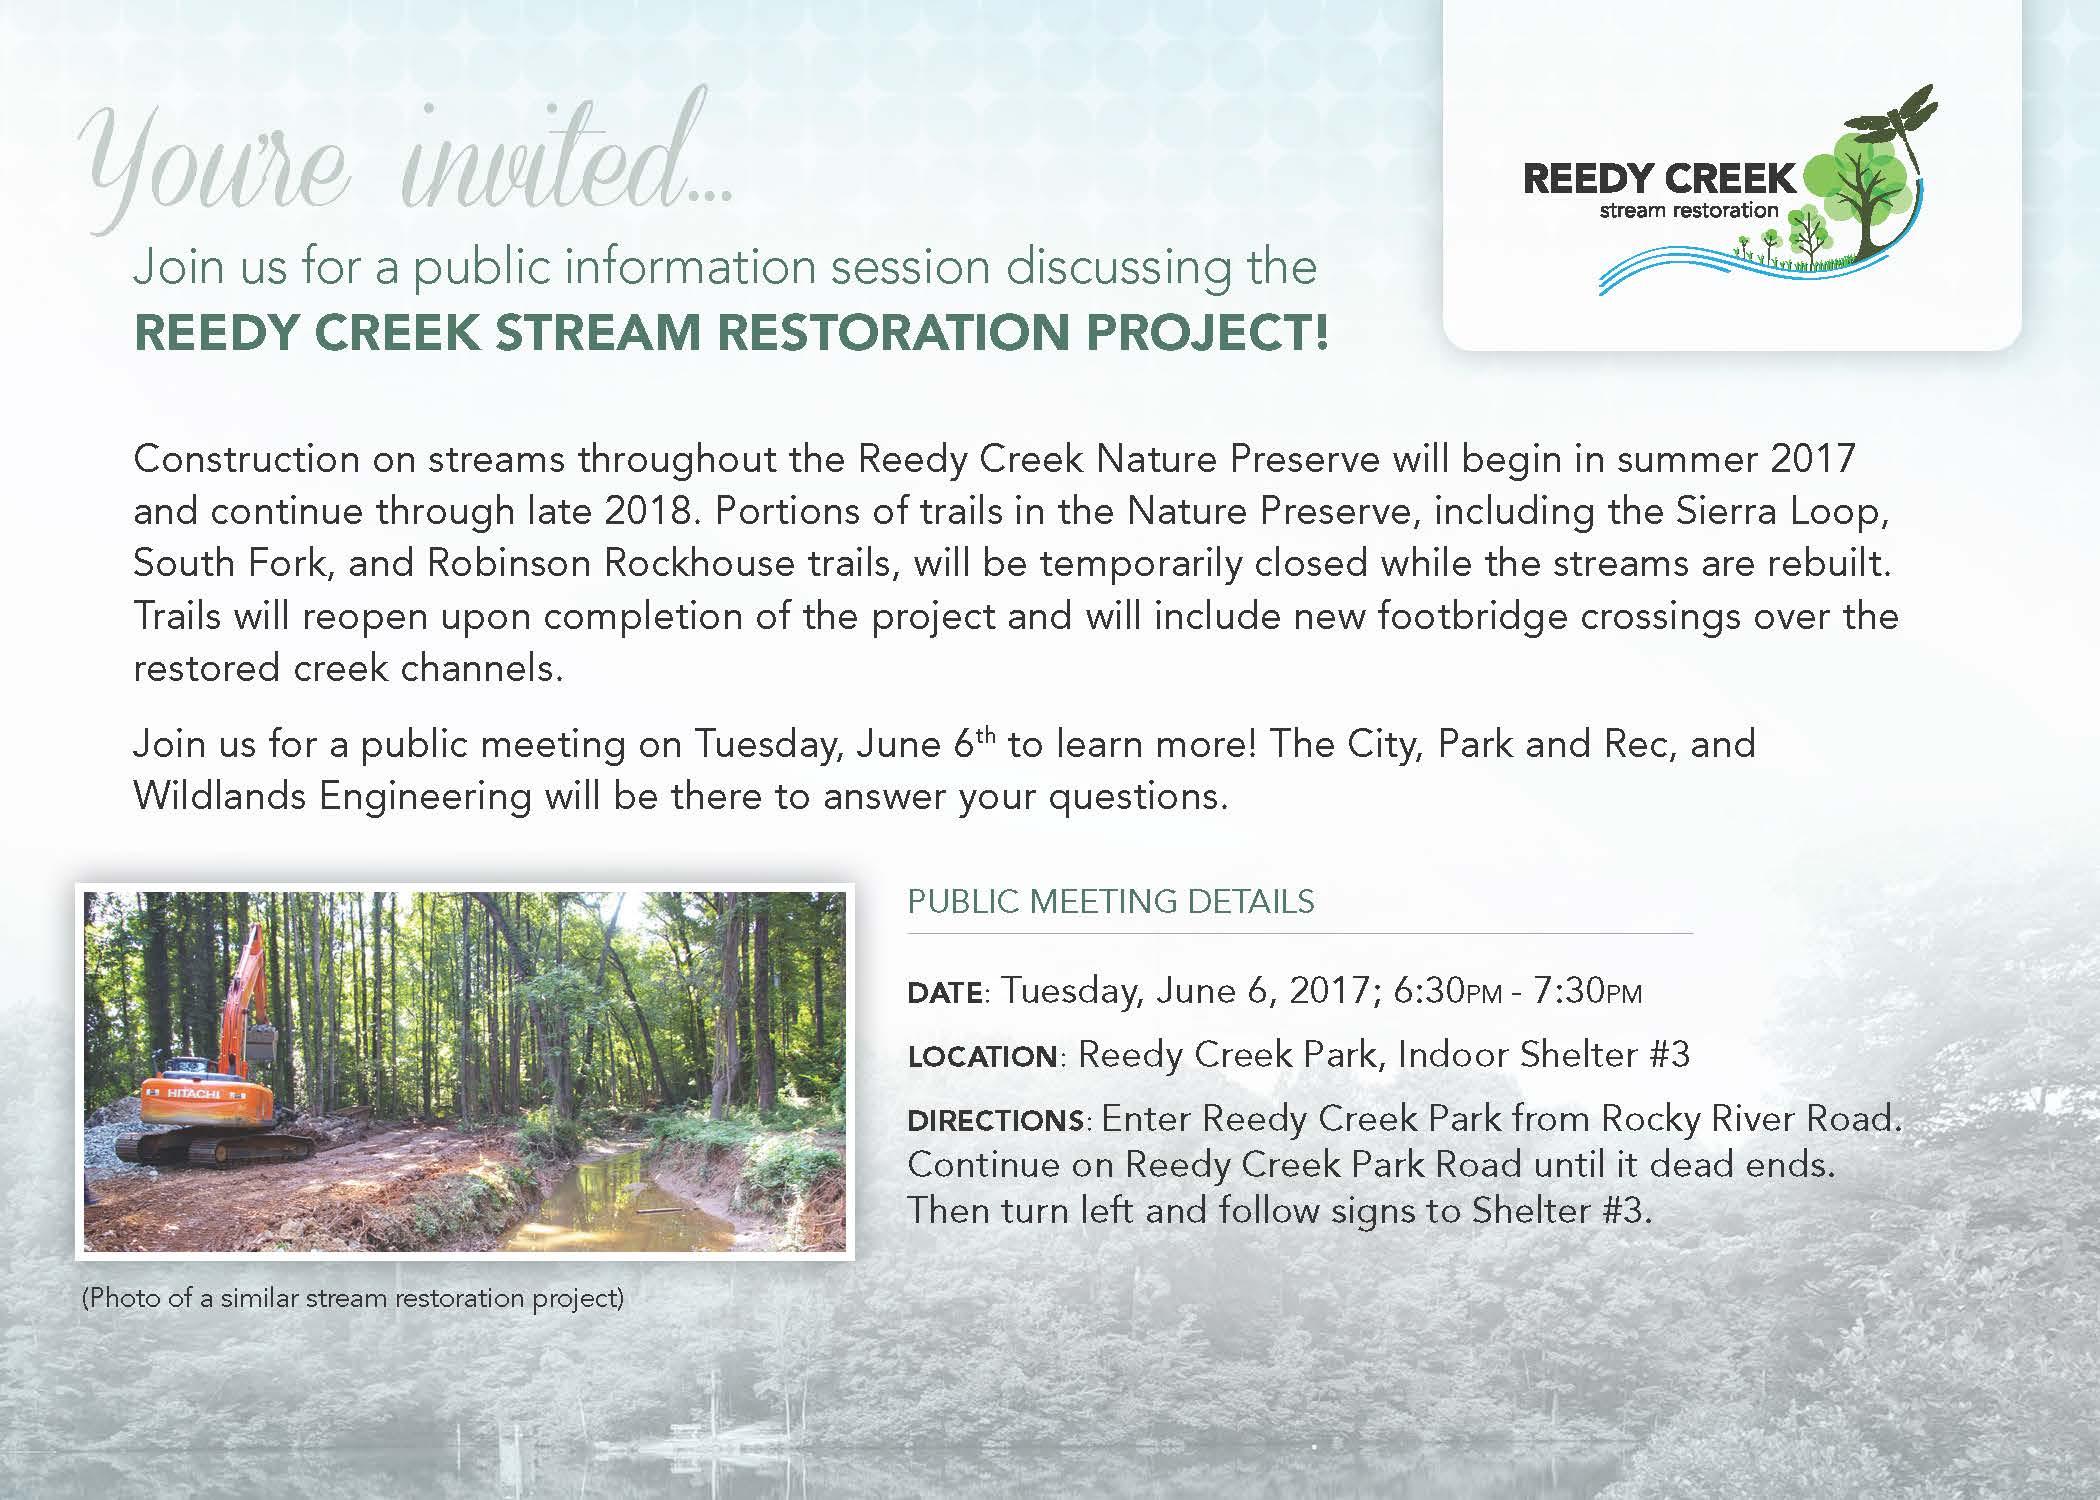 Reedy Creek stream restoration